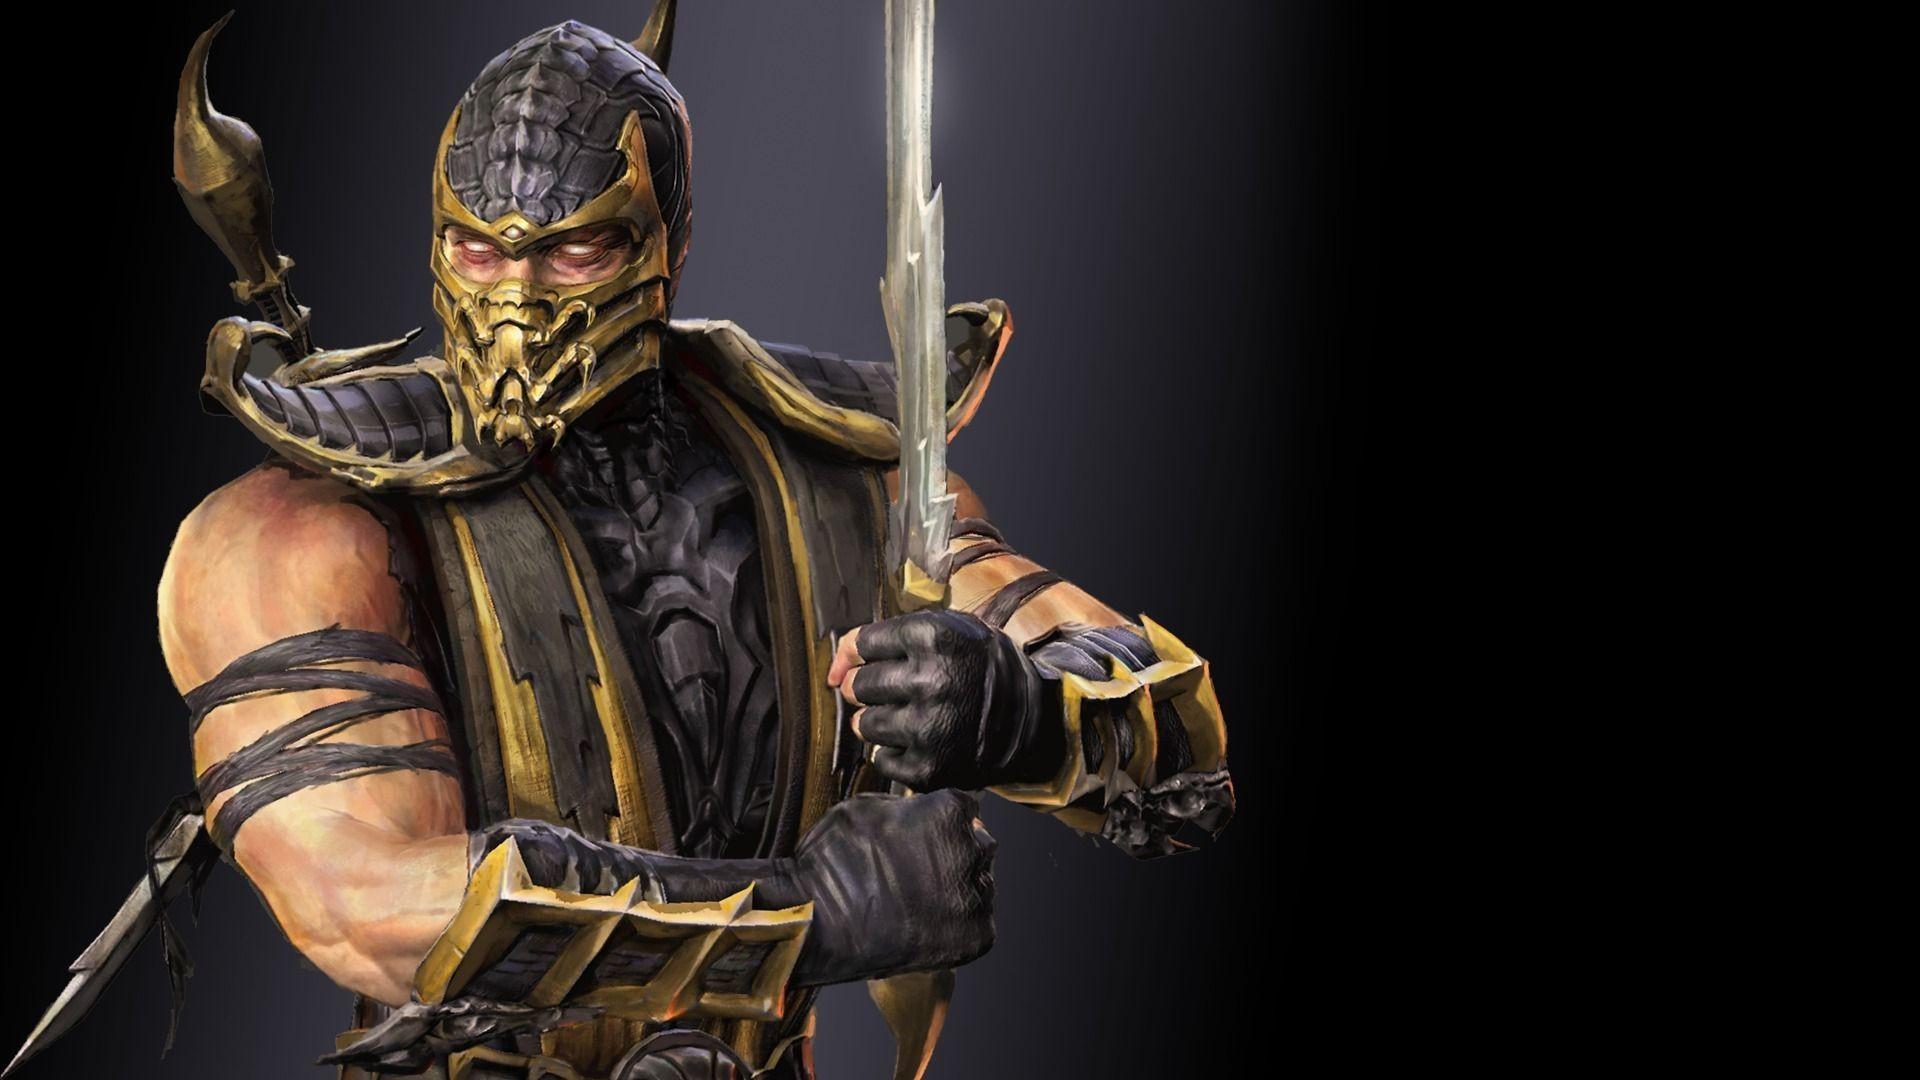 Mortal Kombat 9 Scorpion Wallpaper (63+ pictures)